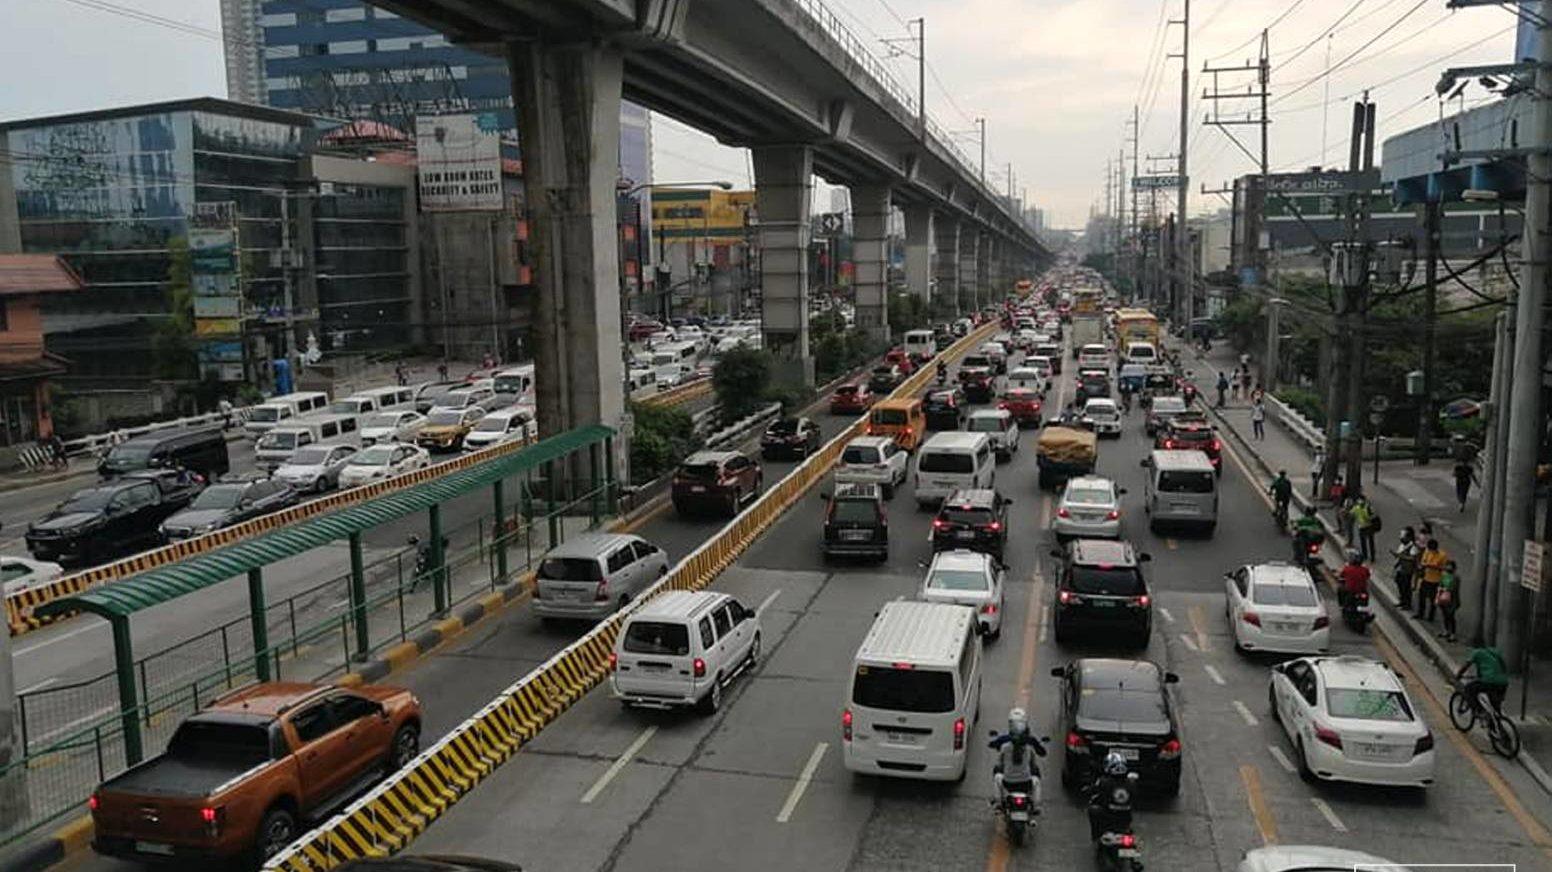 MMDA Re-opens the Dario Bridge U-turn Slot in EDSA